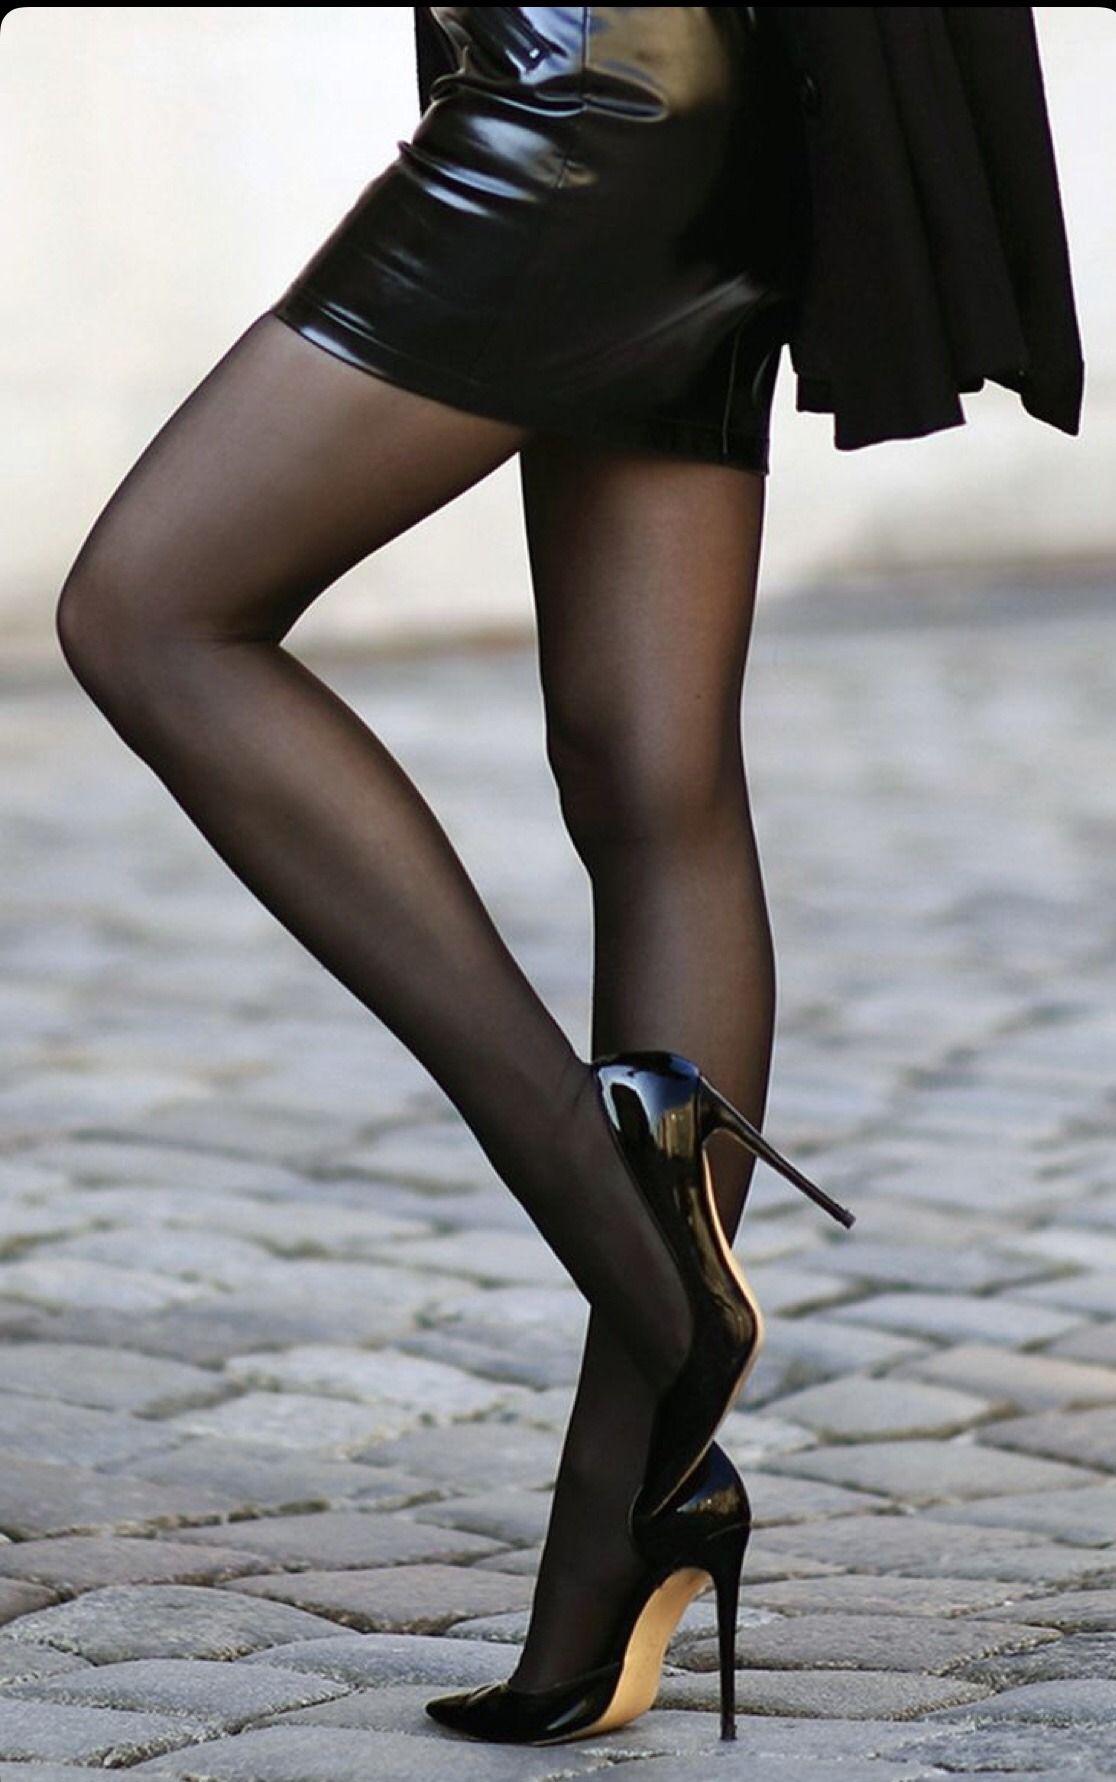 Black Fish Net Stockings